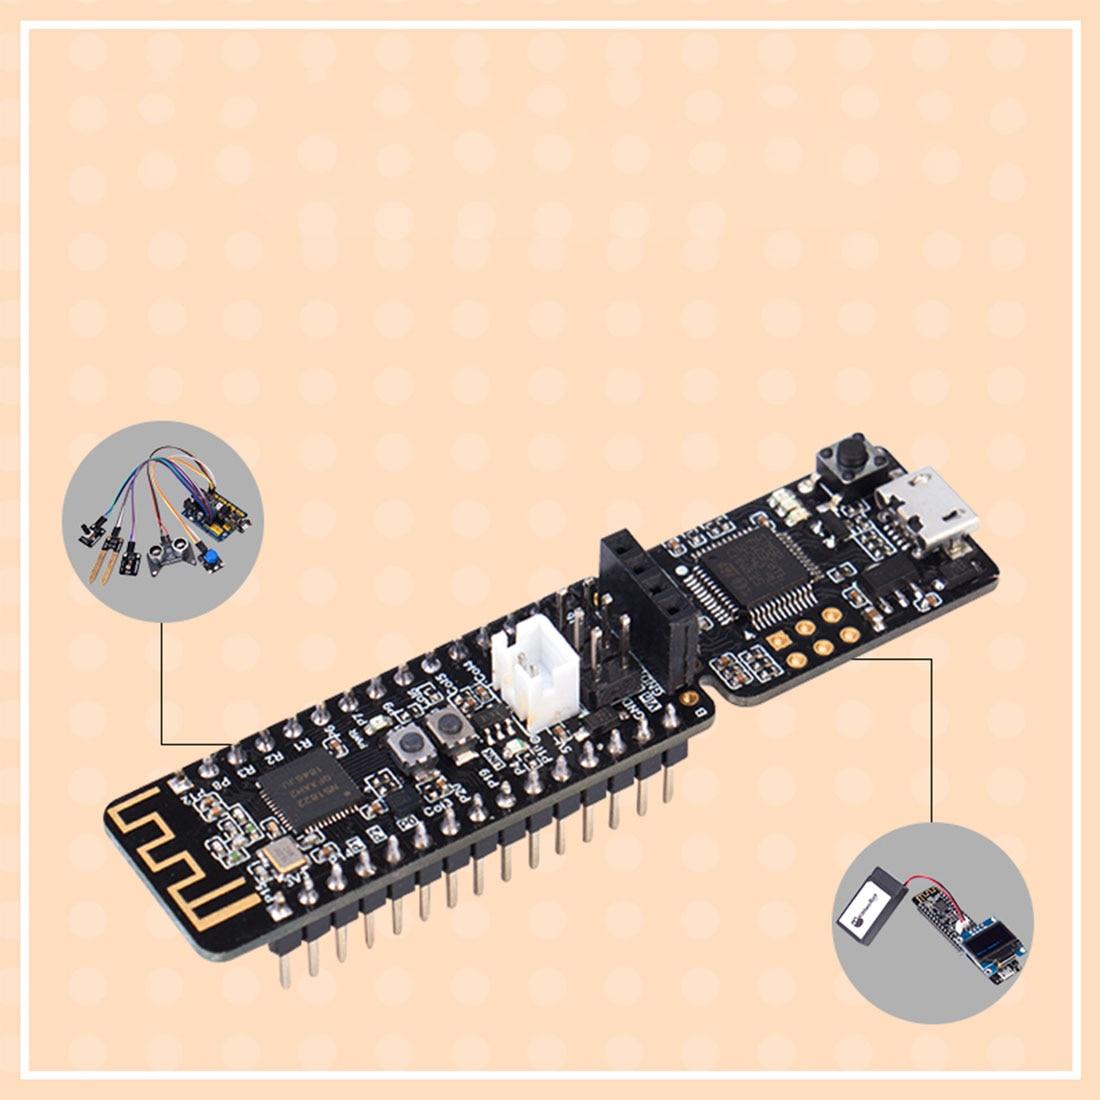 Nanobit Development Board Makecode Graphical Programming Development Board DIY Smart STEM Toy Accessories